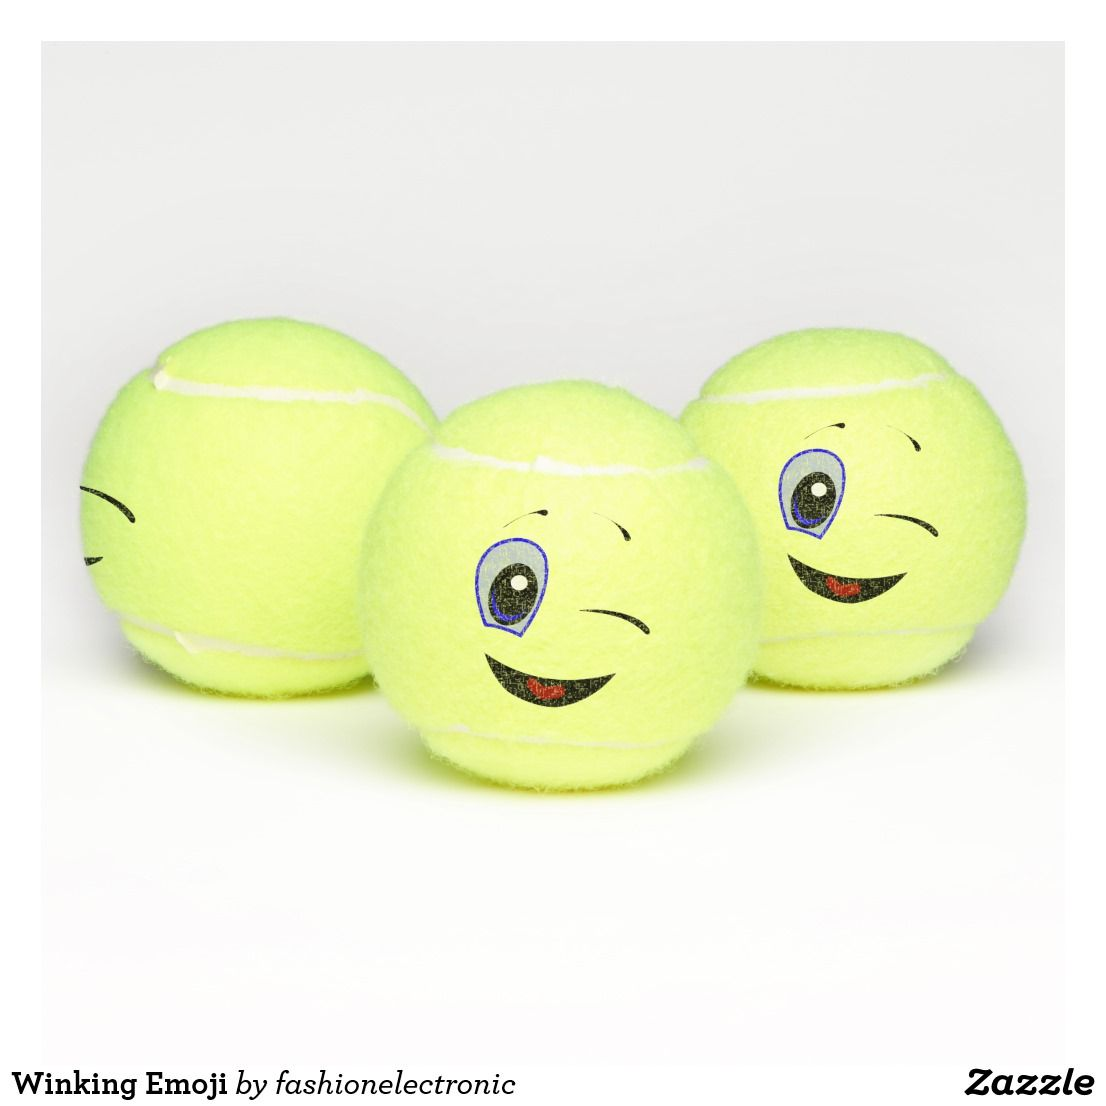 Winking Emoji Tennis Balls Tennis Balls Tennis Emoji Smiley